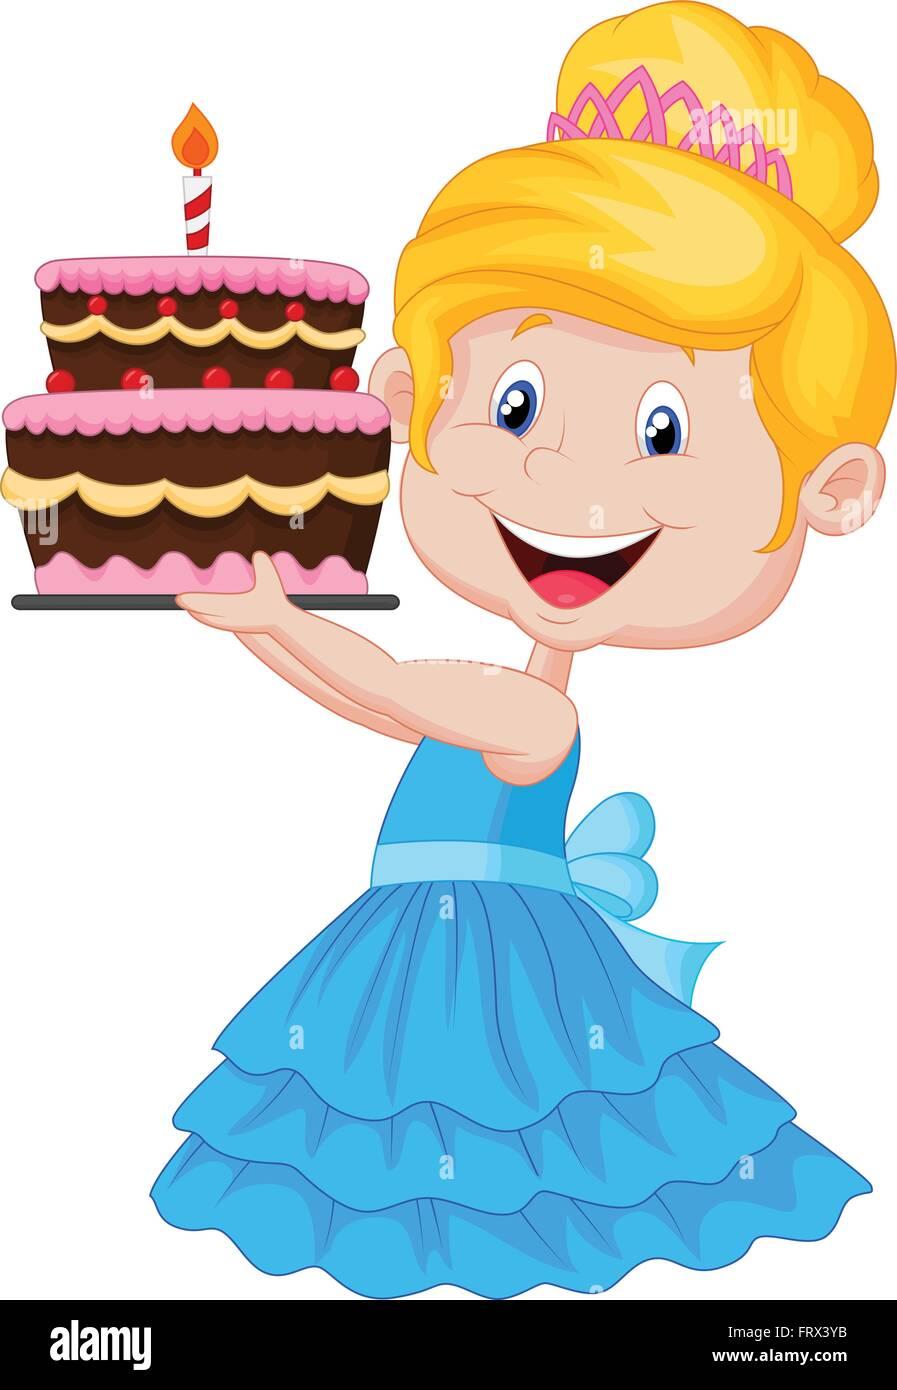 Surprising Little Girl With Birthday Cake Stock Vector Art Illustration Funny Birthday Cards Online Necthendildamsfinfo